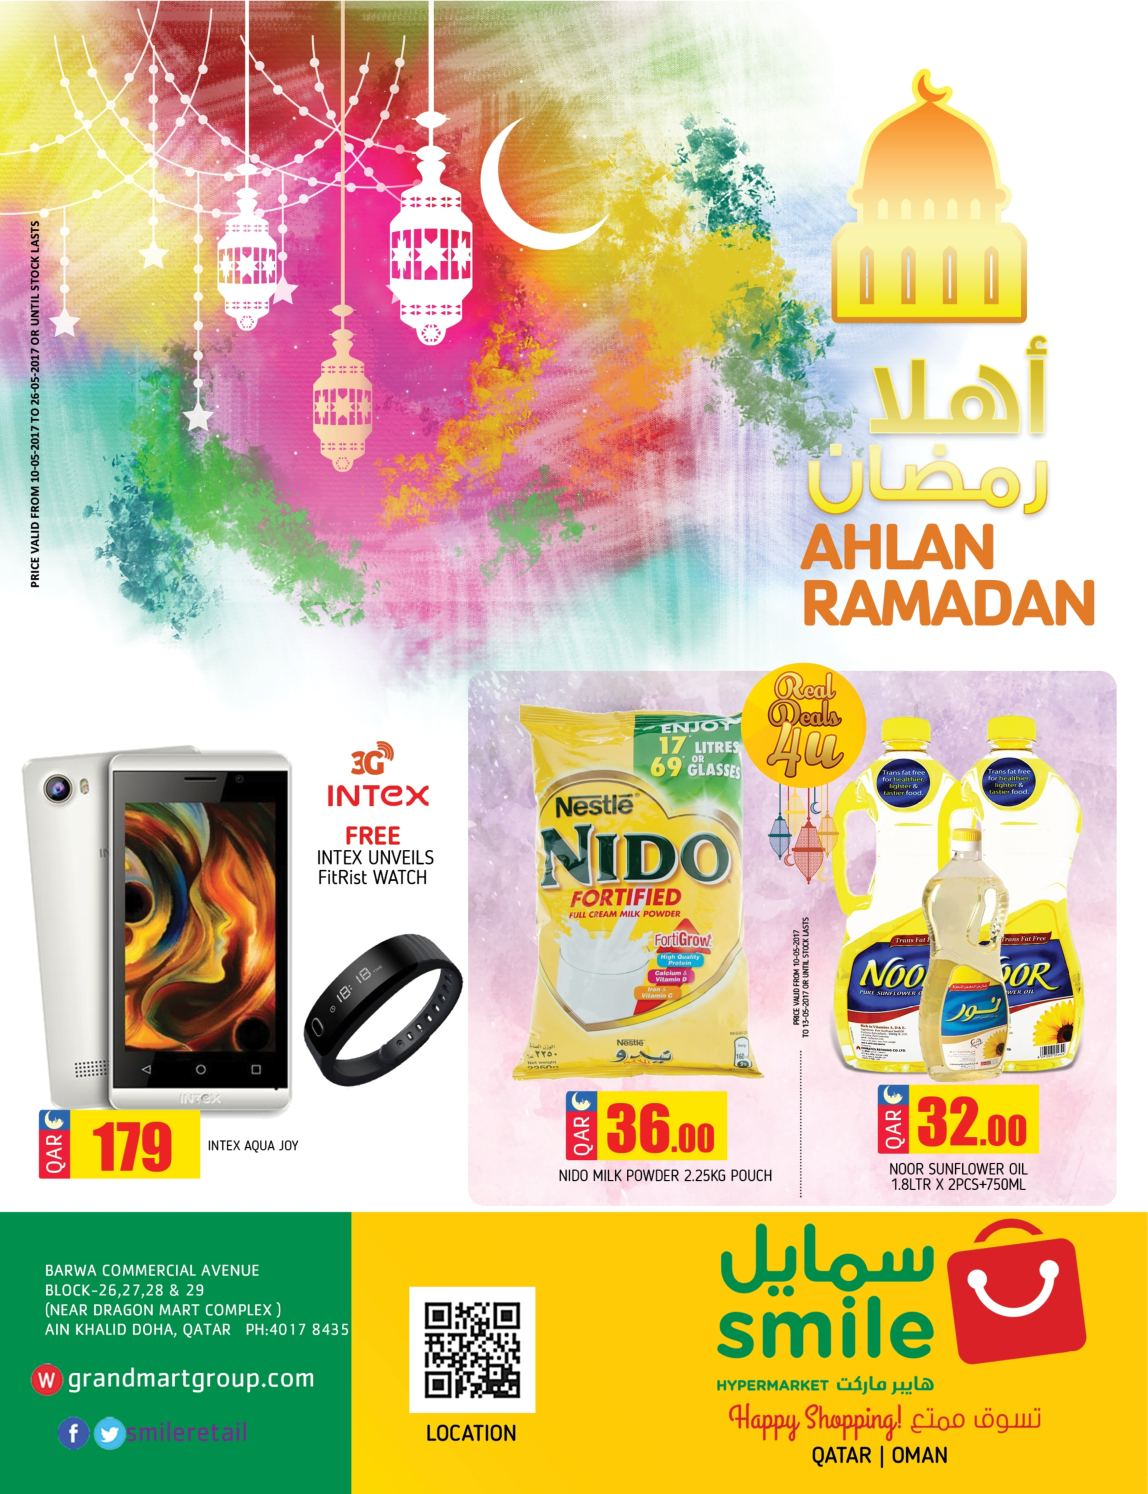 Ahlan Ramdan Promotion Smile Hypermarket Qatar